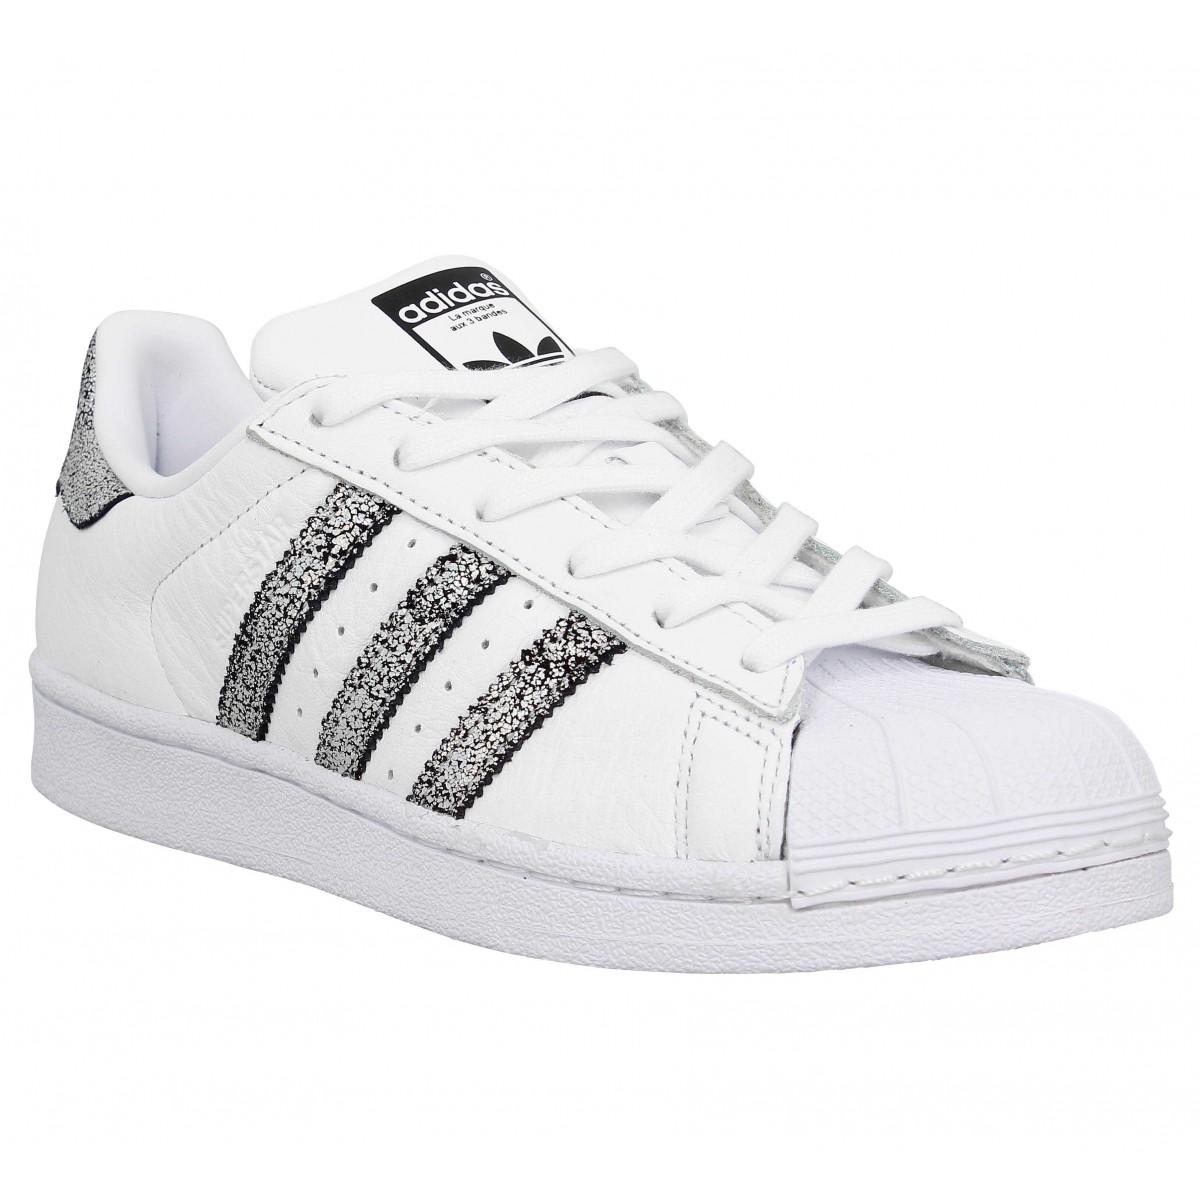 b7e0ba297d0 Nouveaux Designs Chaussures En Cuir Femmes Adidas Superstar II Argent Blanc  XW26850 Pas cher soldes adidas cuir femme